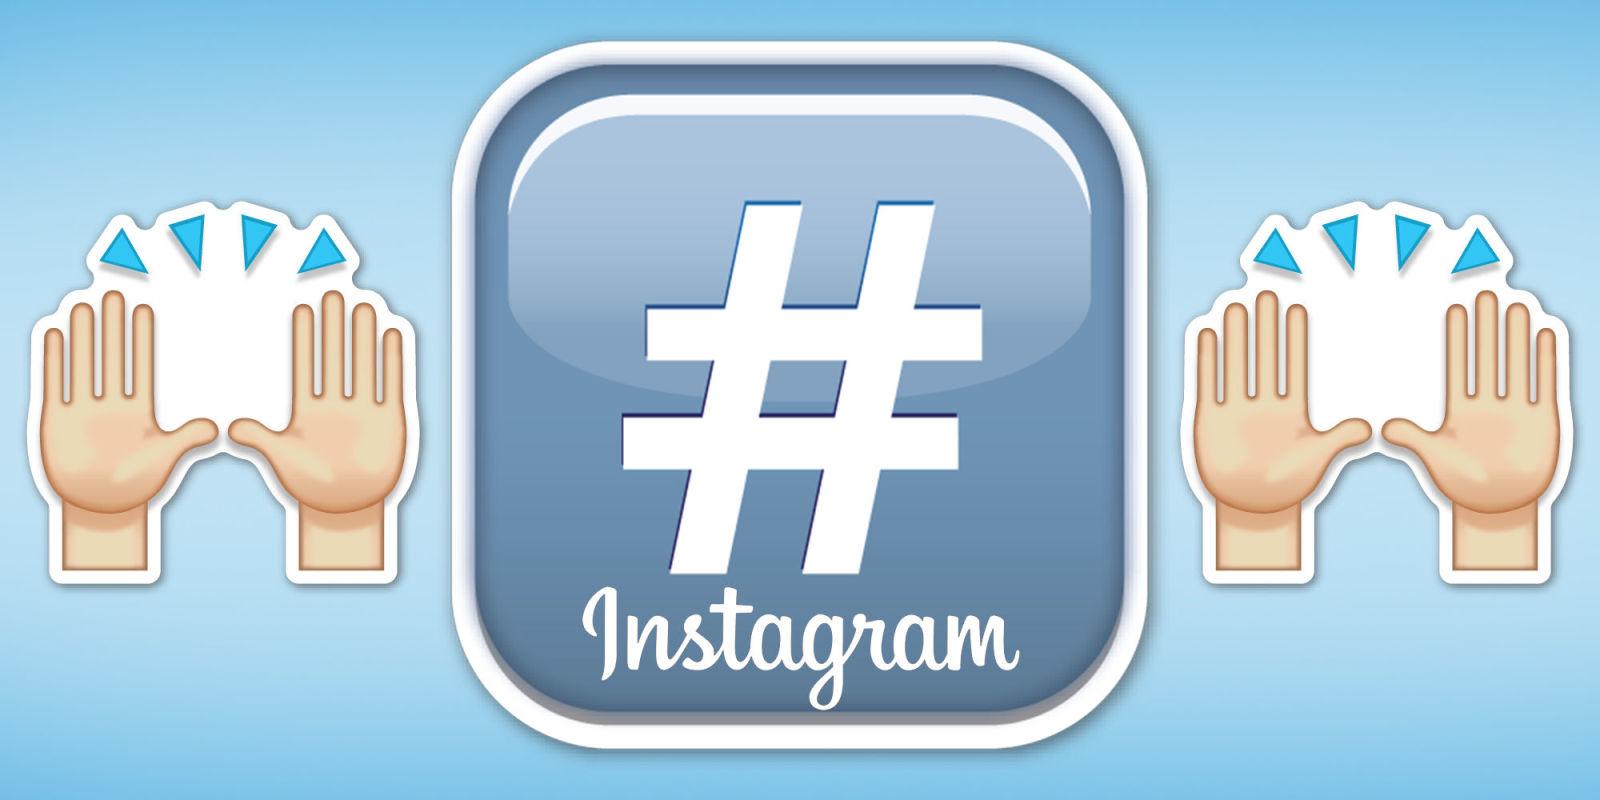 landscape-1430160977-hashtag-instagram